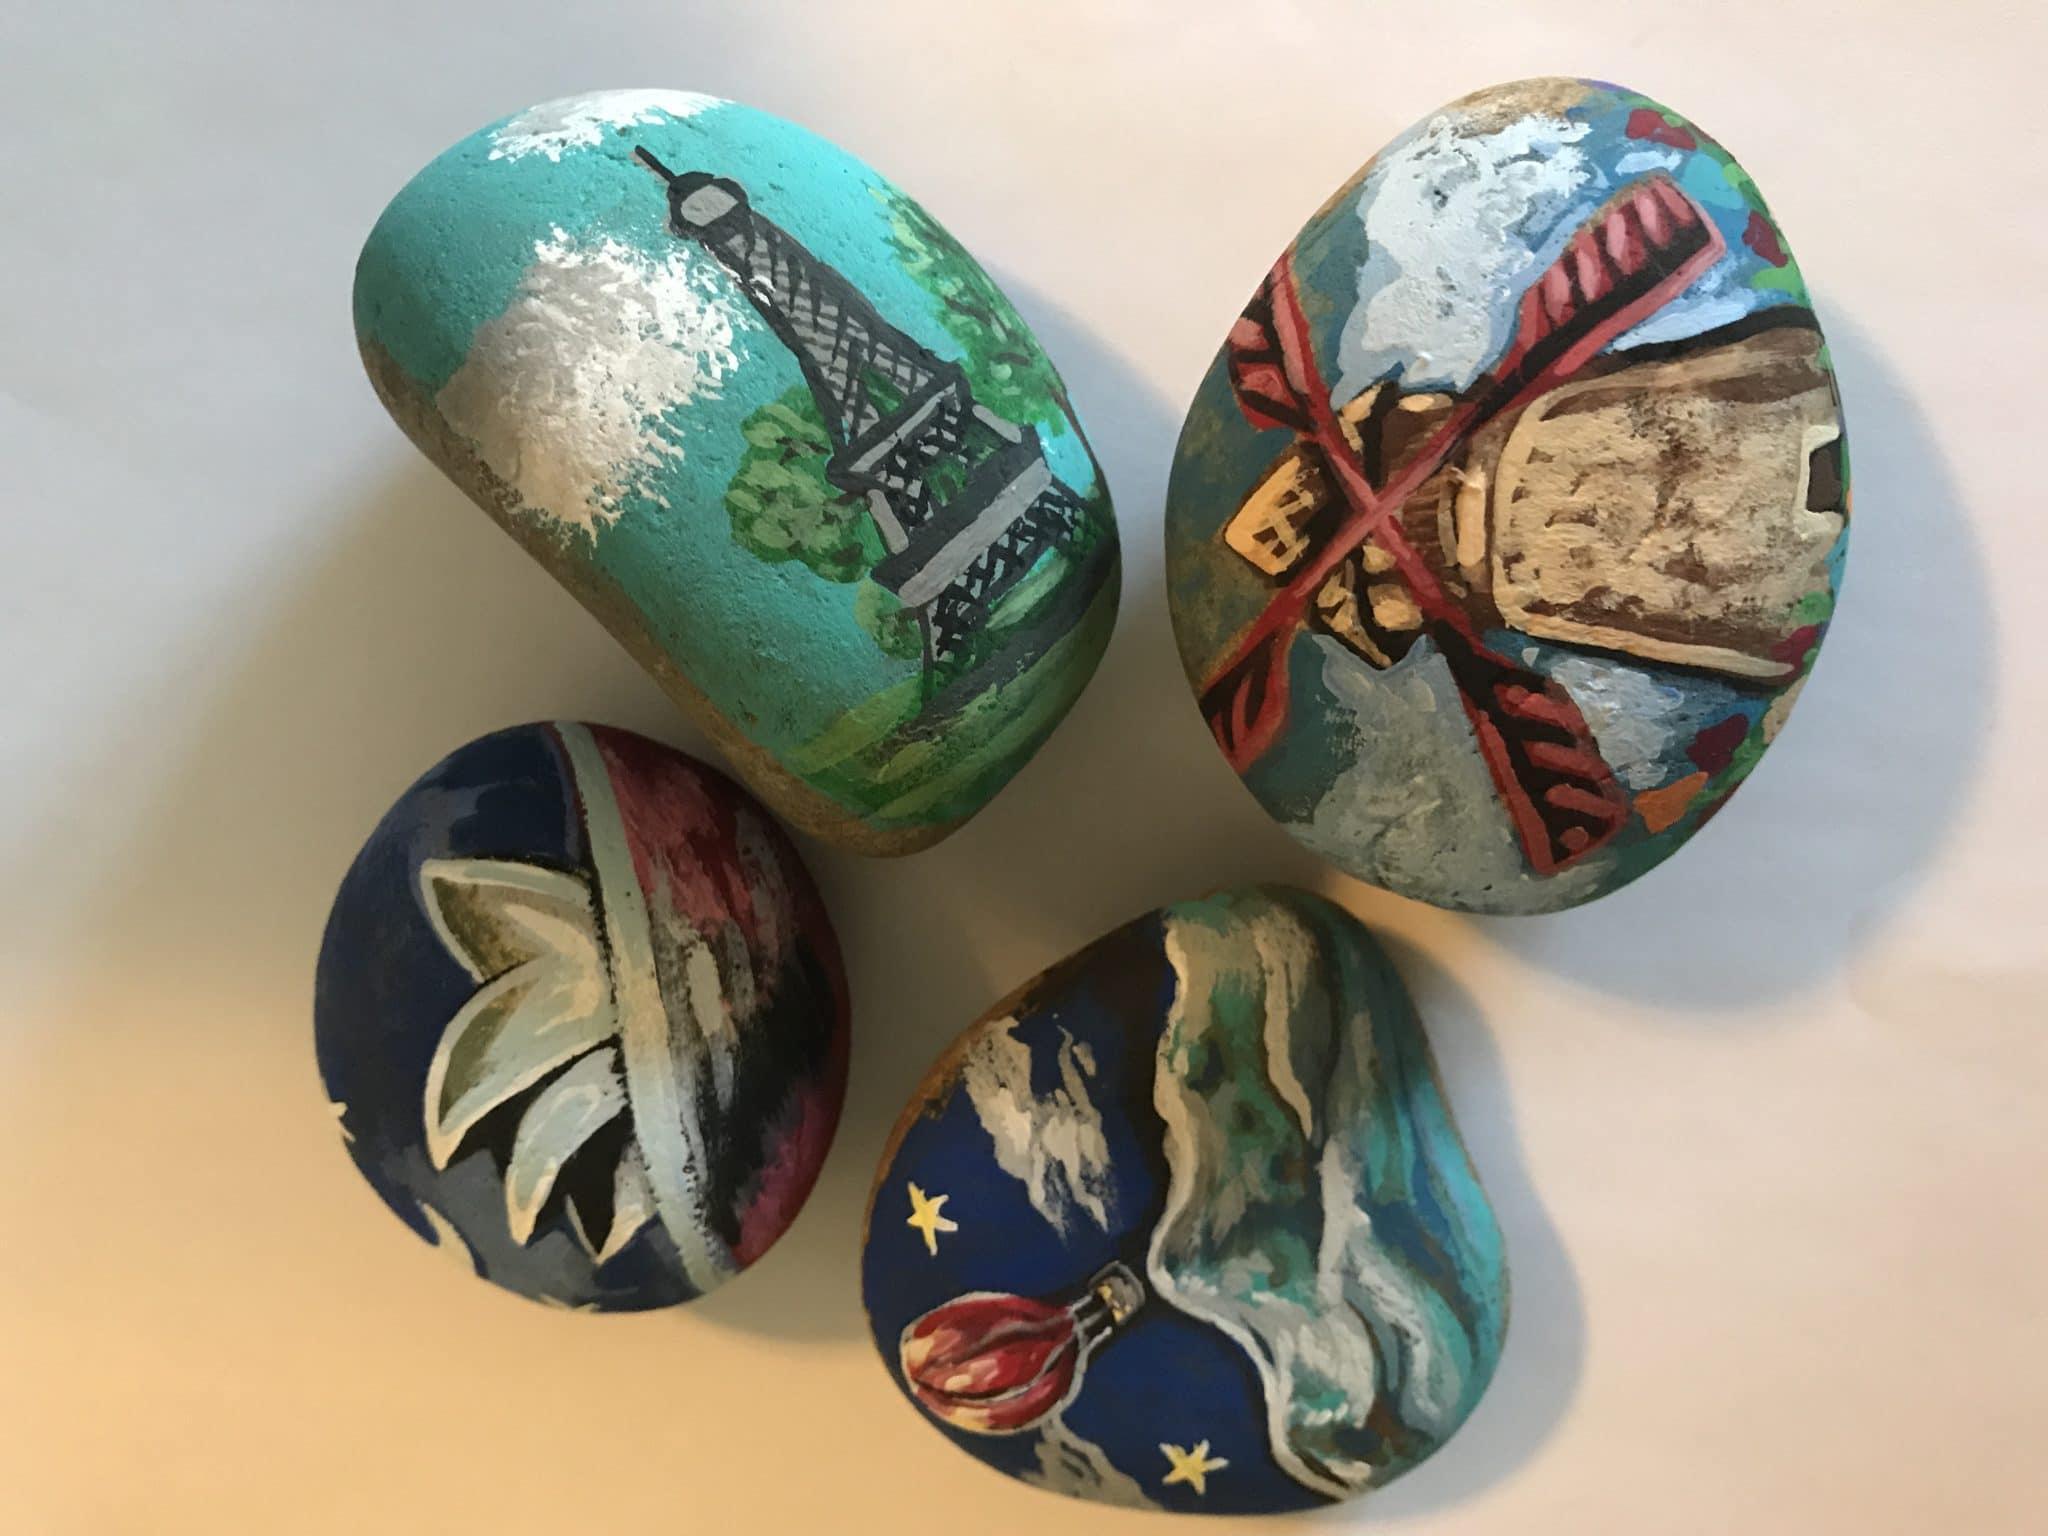 travel kindness rocks